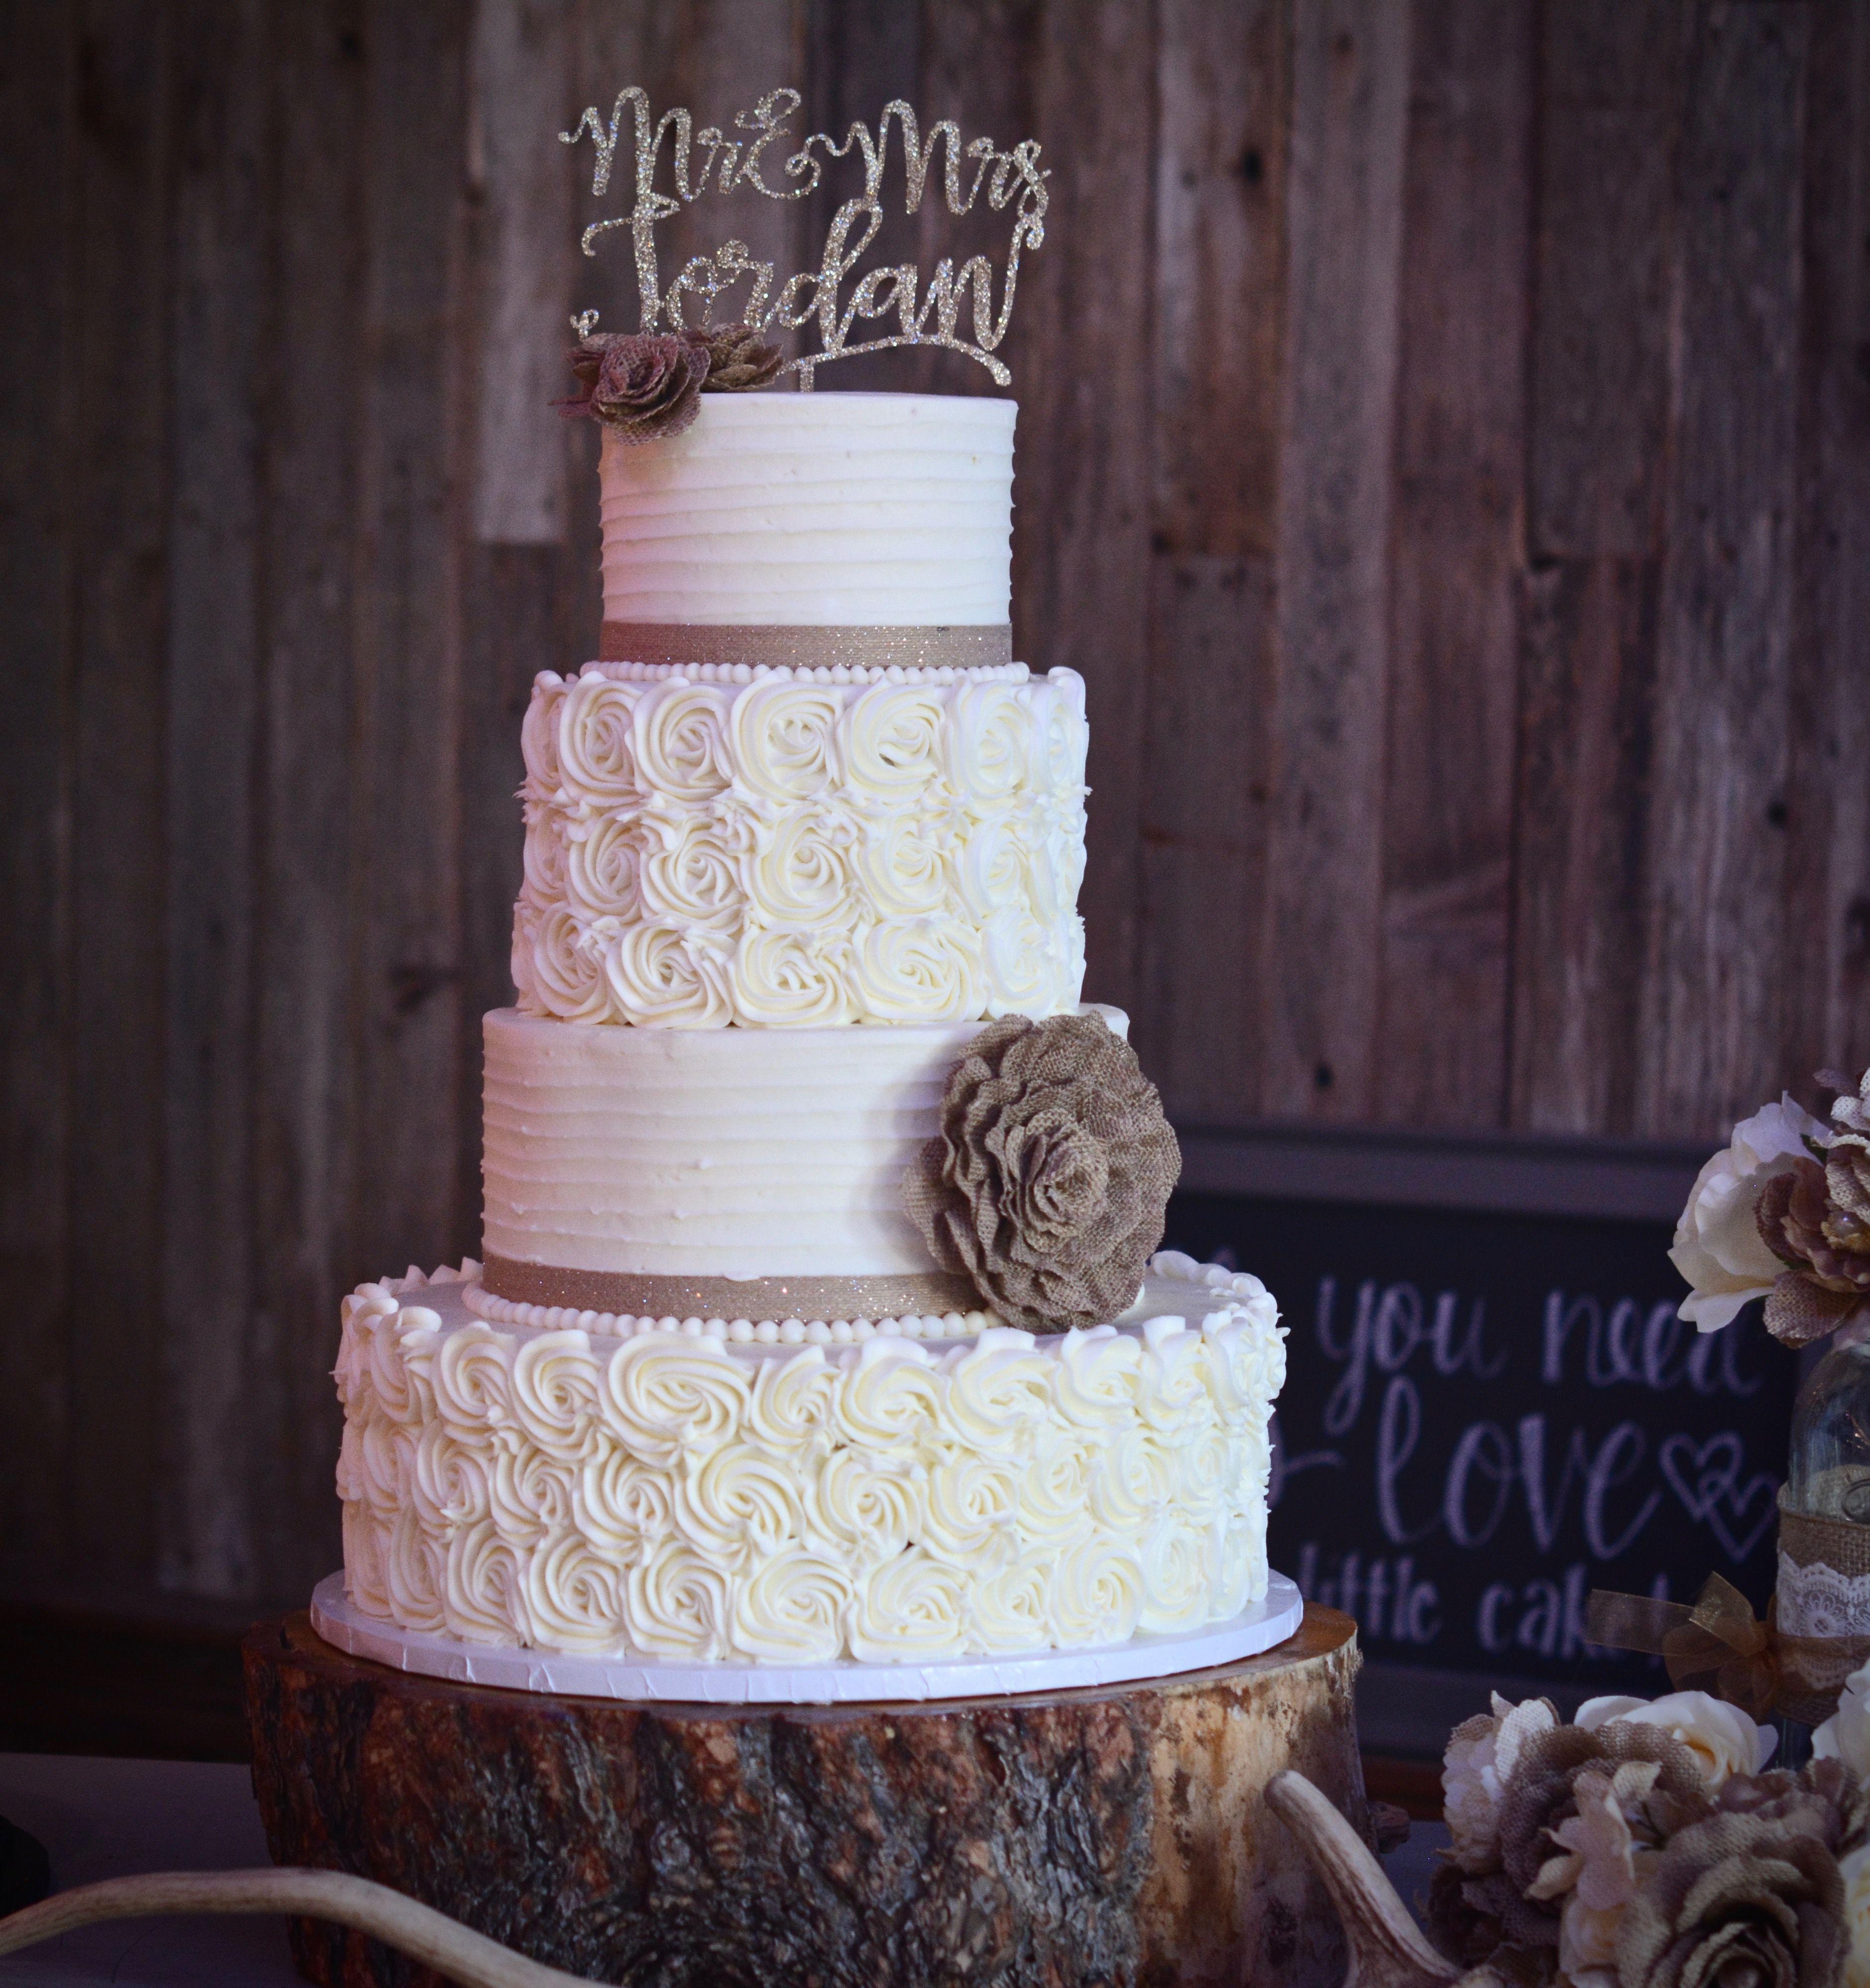 Malinalli Wedding Cakes Dessert Tables Is A In San Antonio Tx Read Reviews